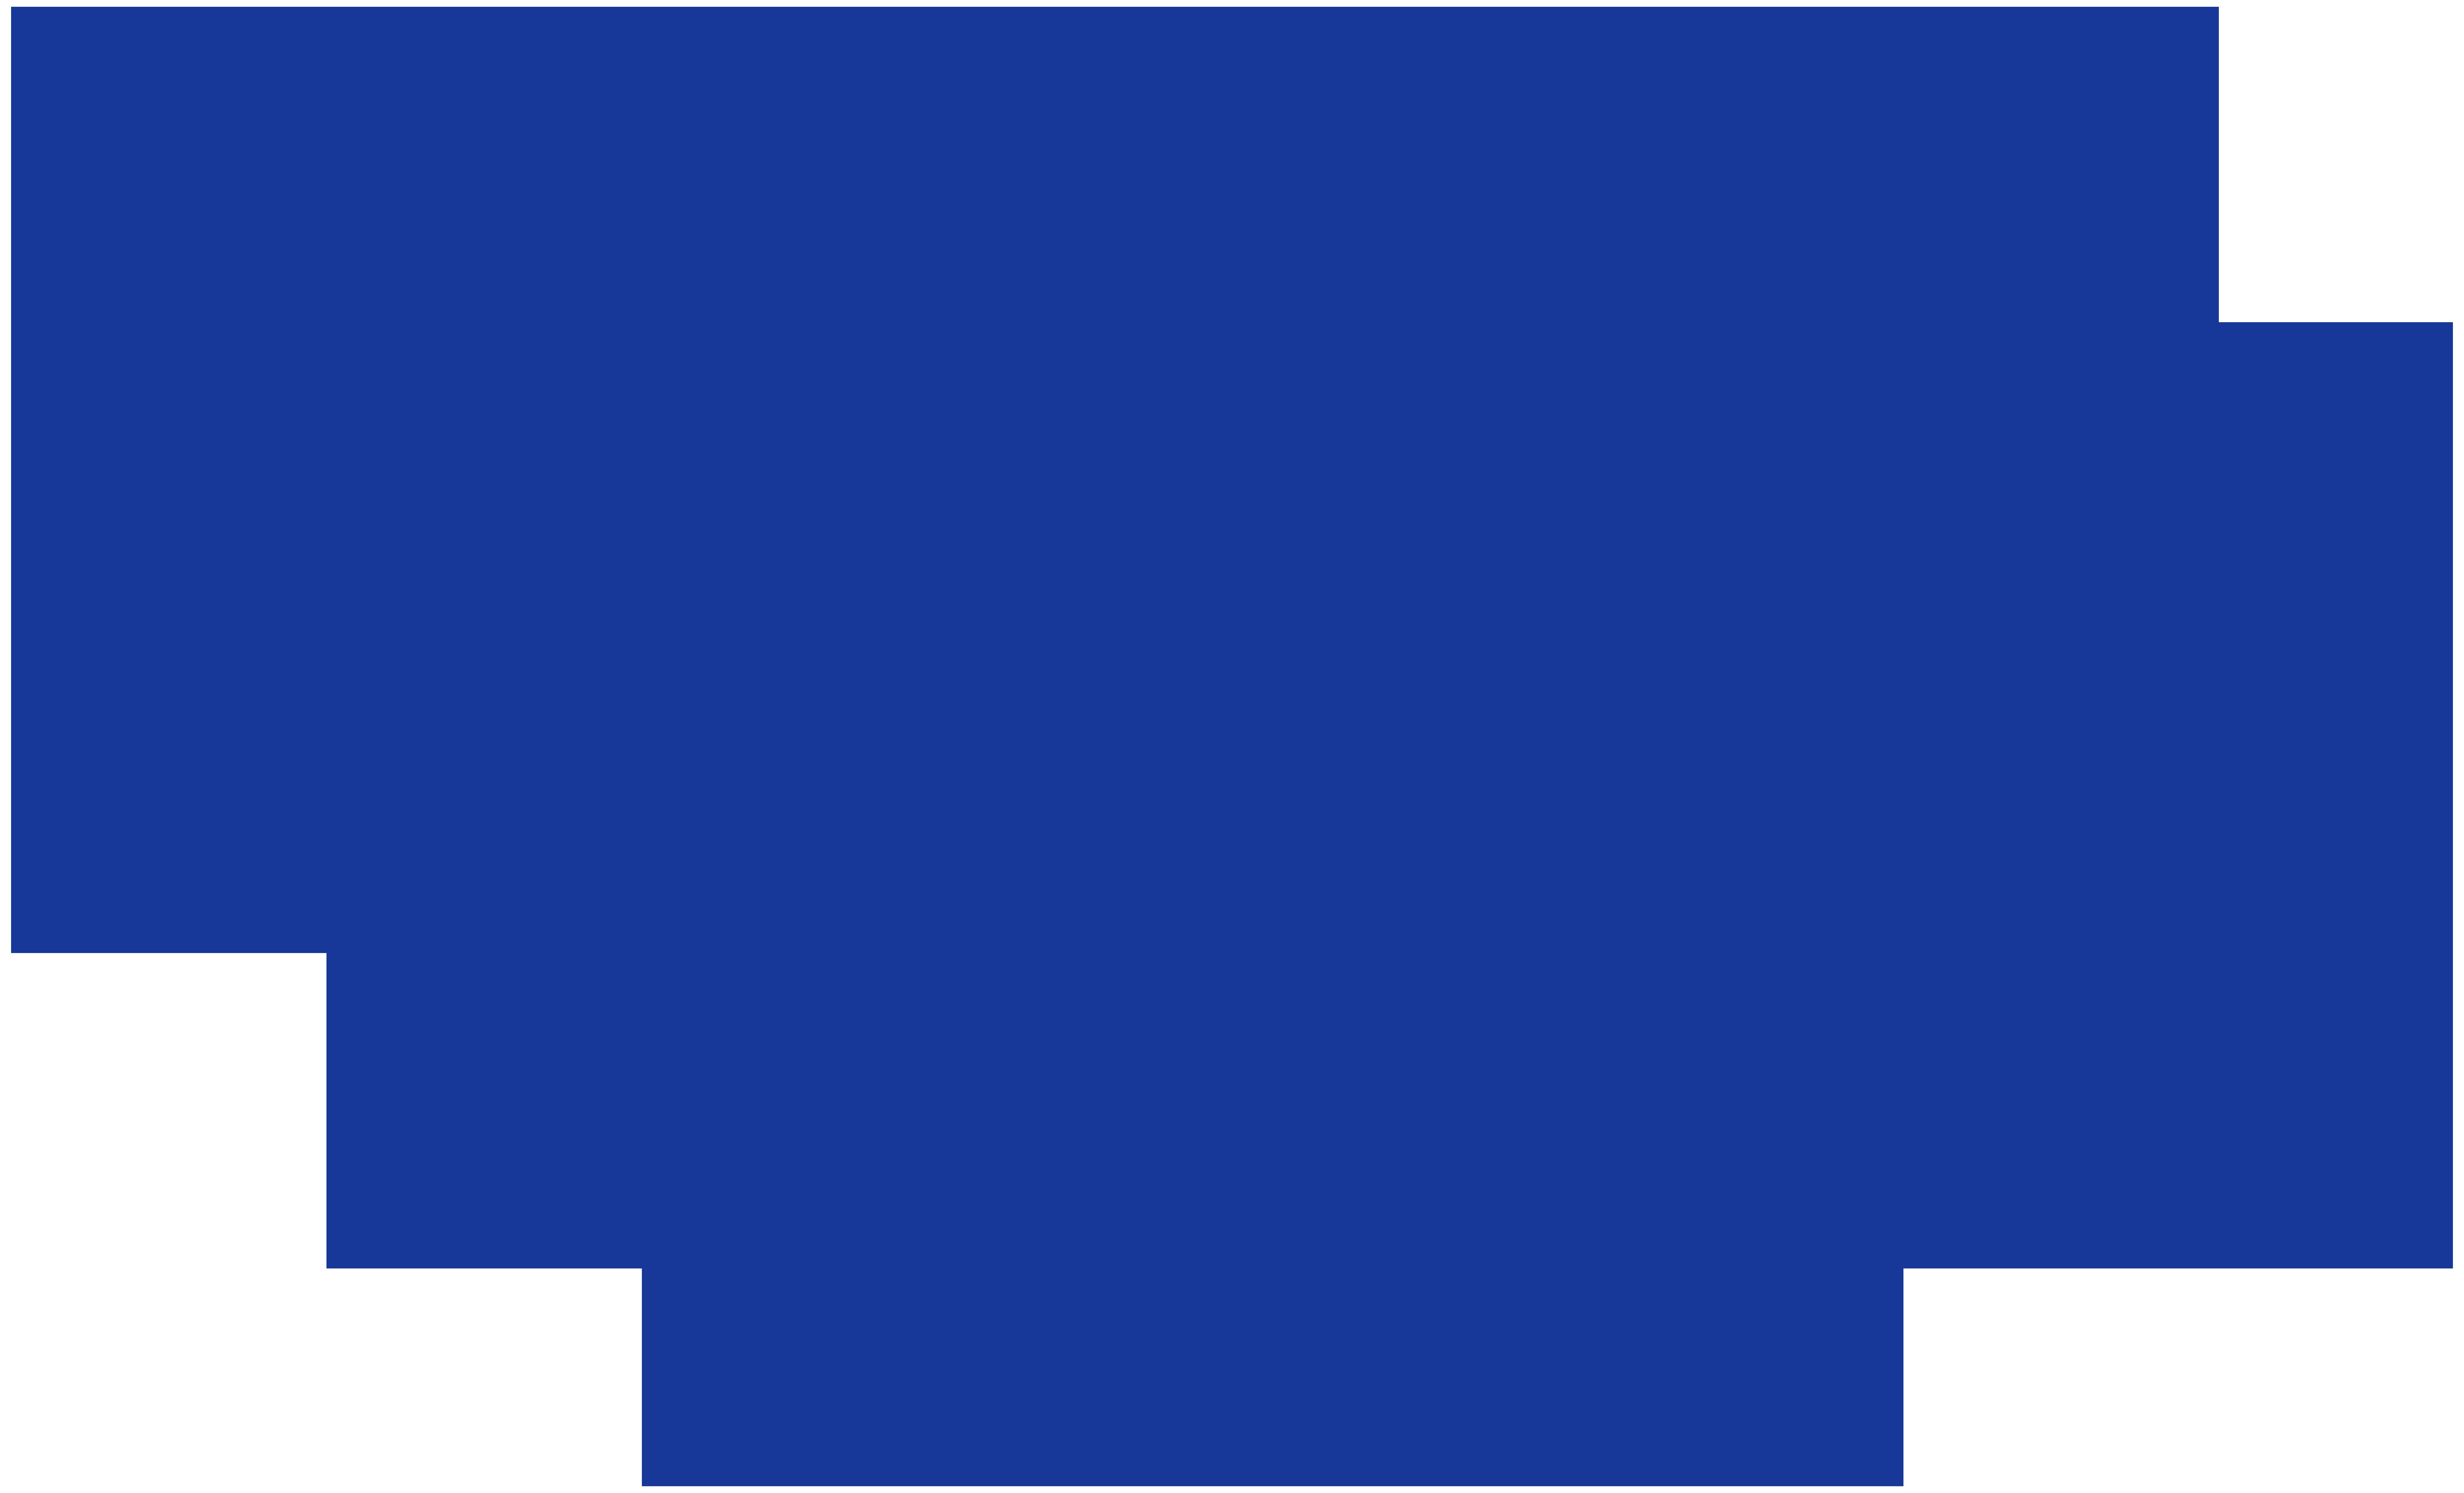 Handshake Transparent Png Clip Art Image Gallery Yopriceville High Quality Images And Transparent Png Free Clipart Gambar Lukisan Wajah Gambar Lucu